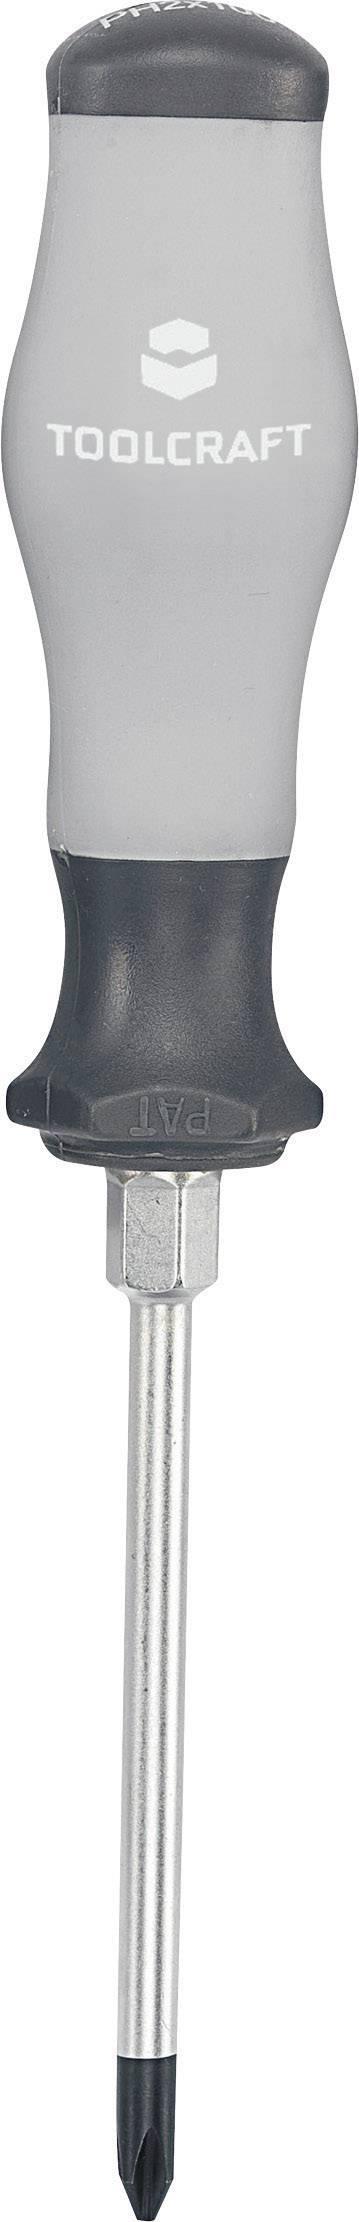 Krížový skrutkovač TOOLCRAFT 820740, PH 2, dĺžka čepele: 100 mm